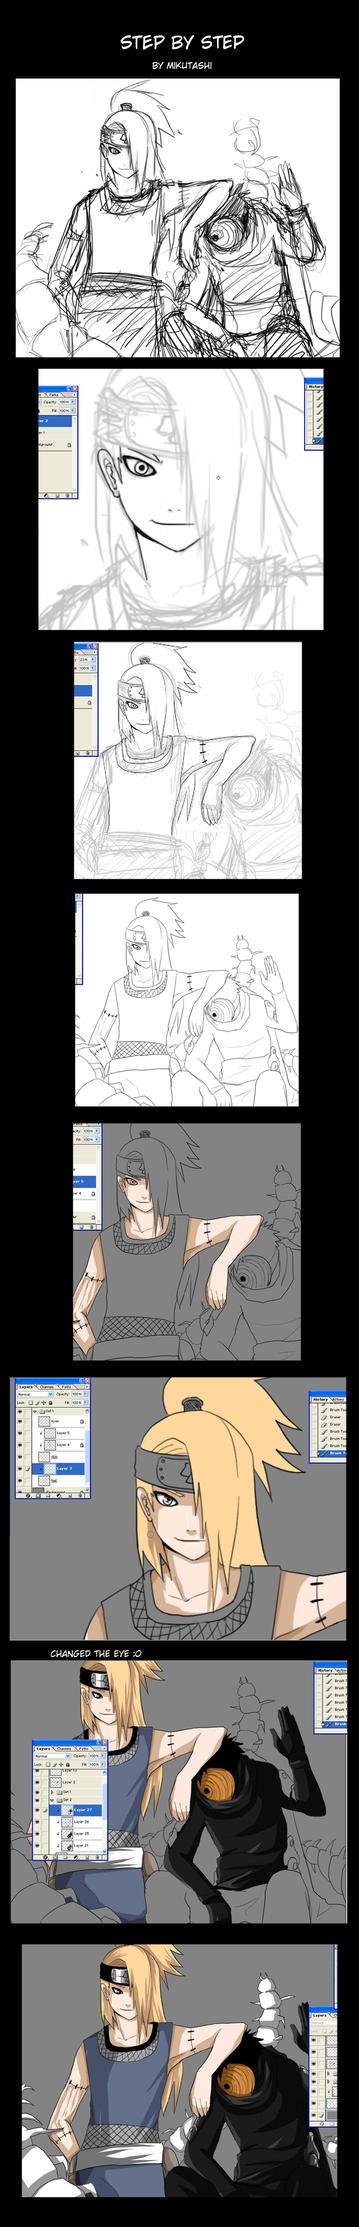 Is this tutorial by Mikutashi